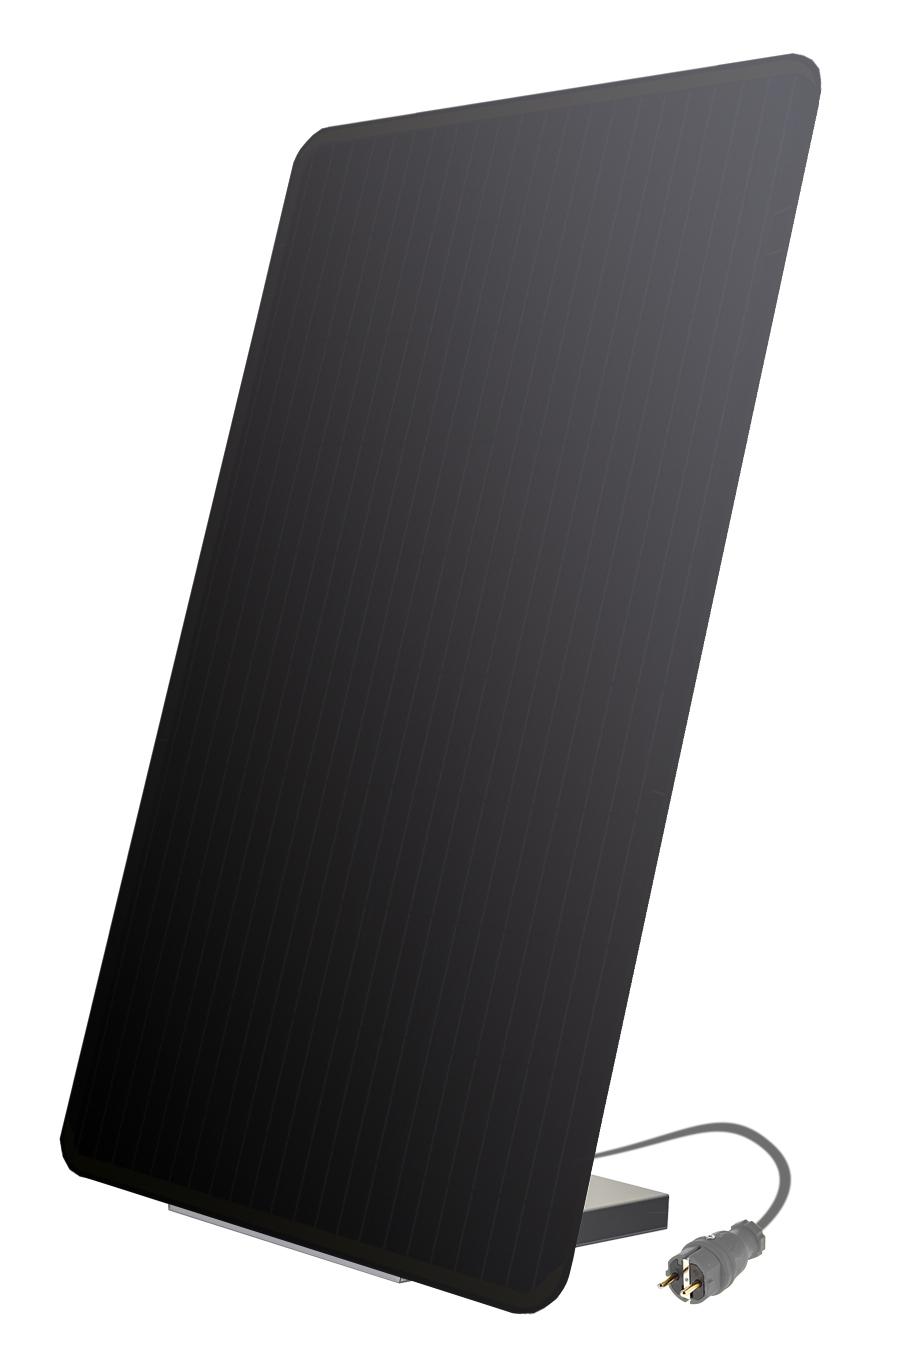 Comfort-Set: Plug-In Solarmodul MEIN KRAFTWERK - Black Edition inkl. Montagekit